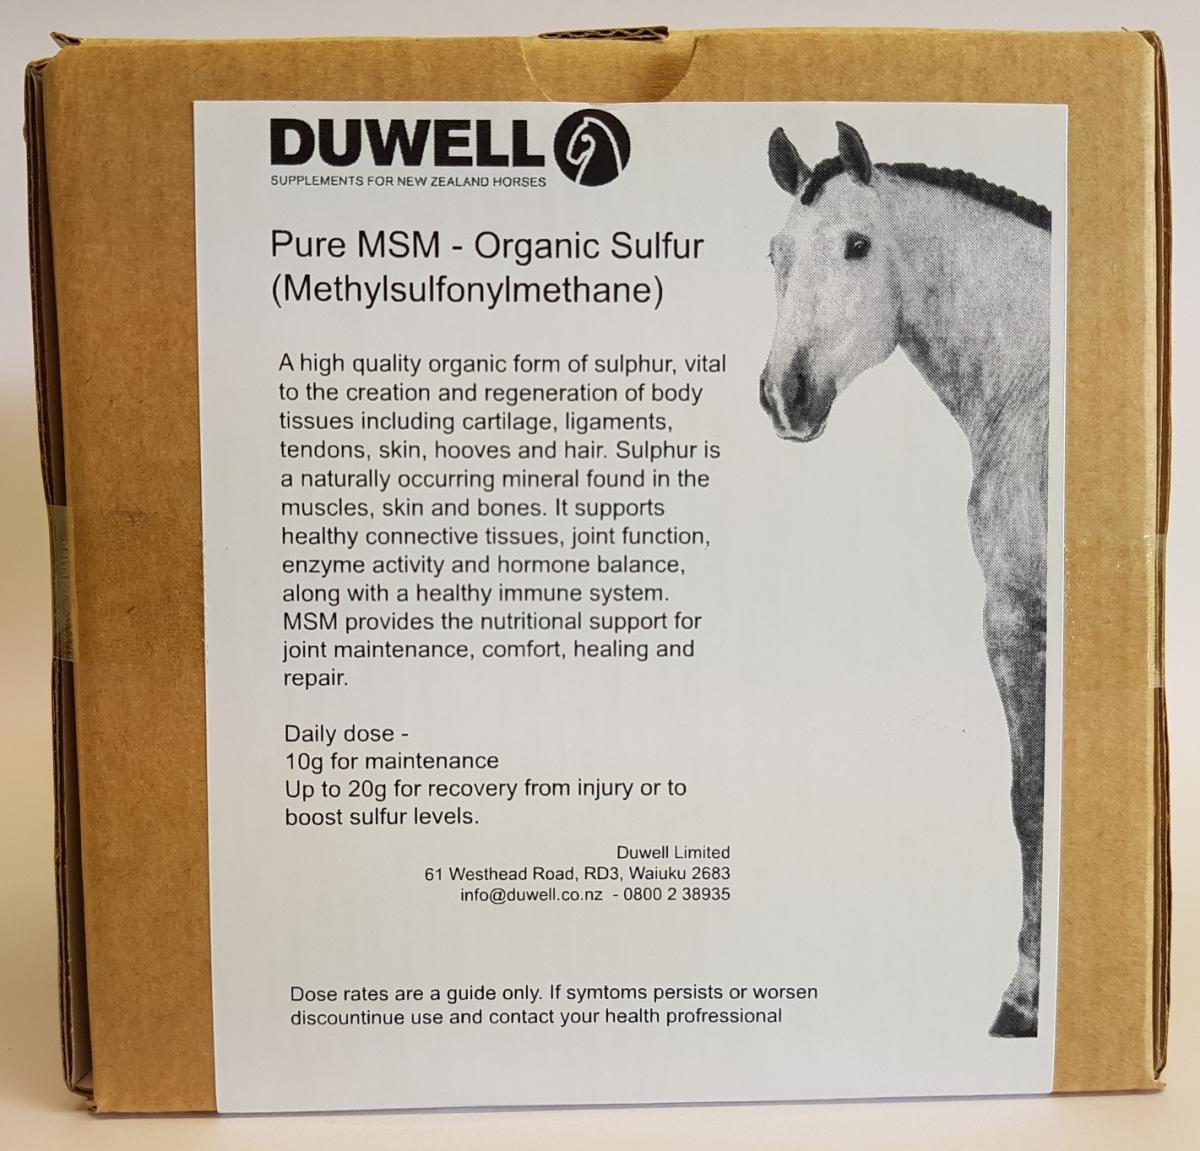 MSM | Duwell Ltd | Equine Supplements for a Better Horse